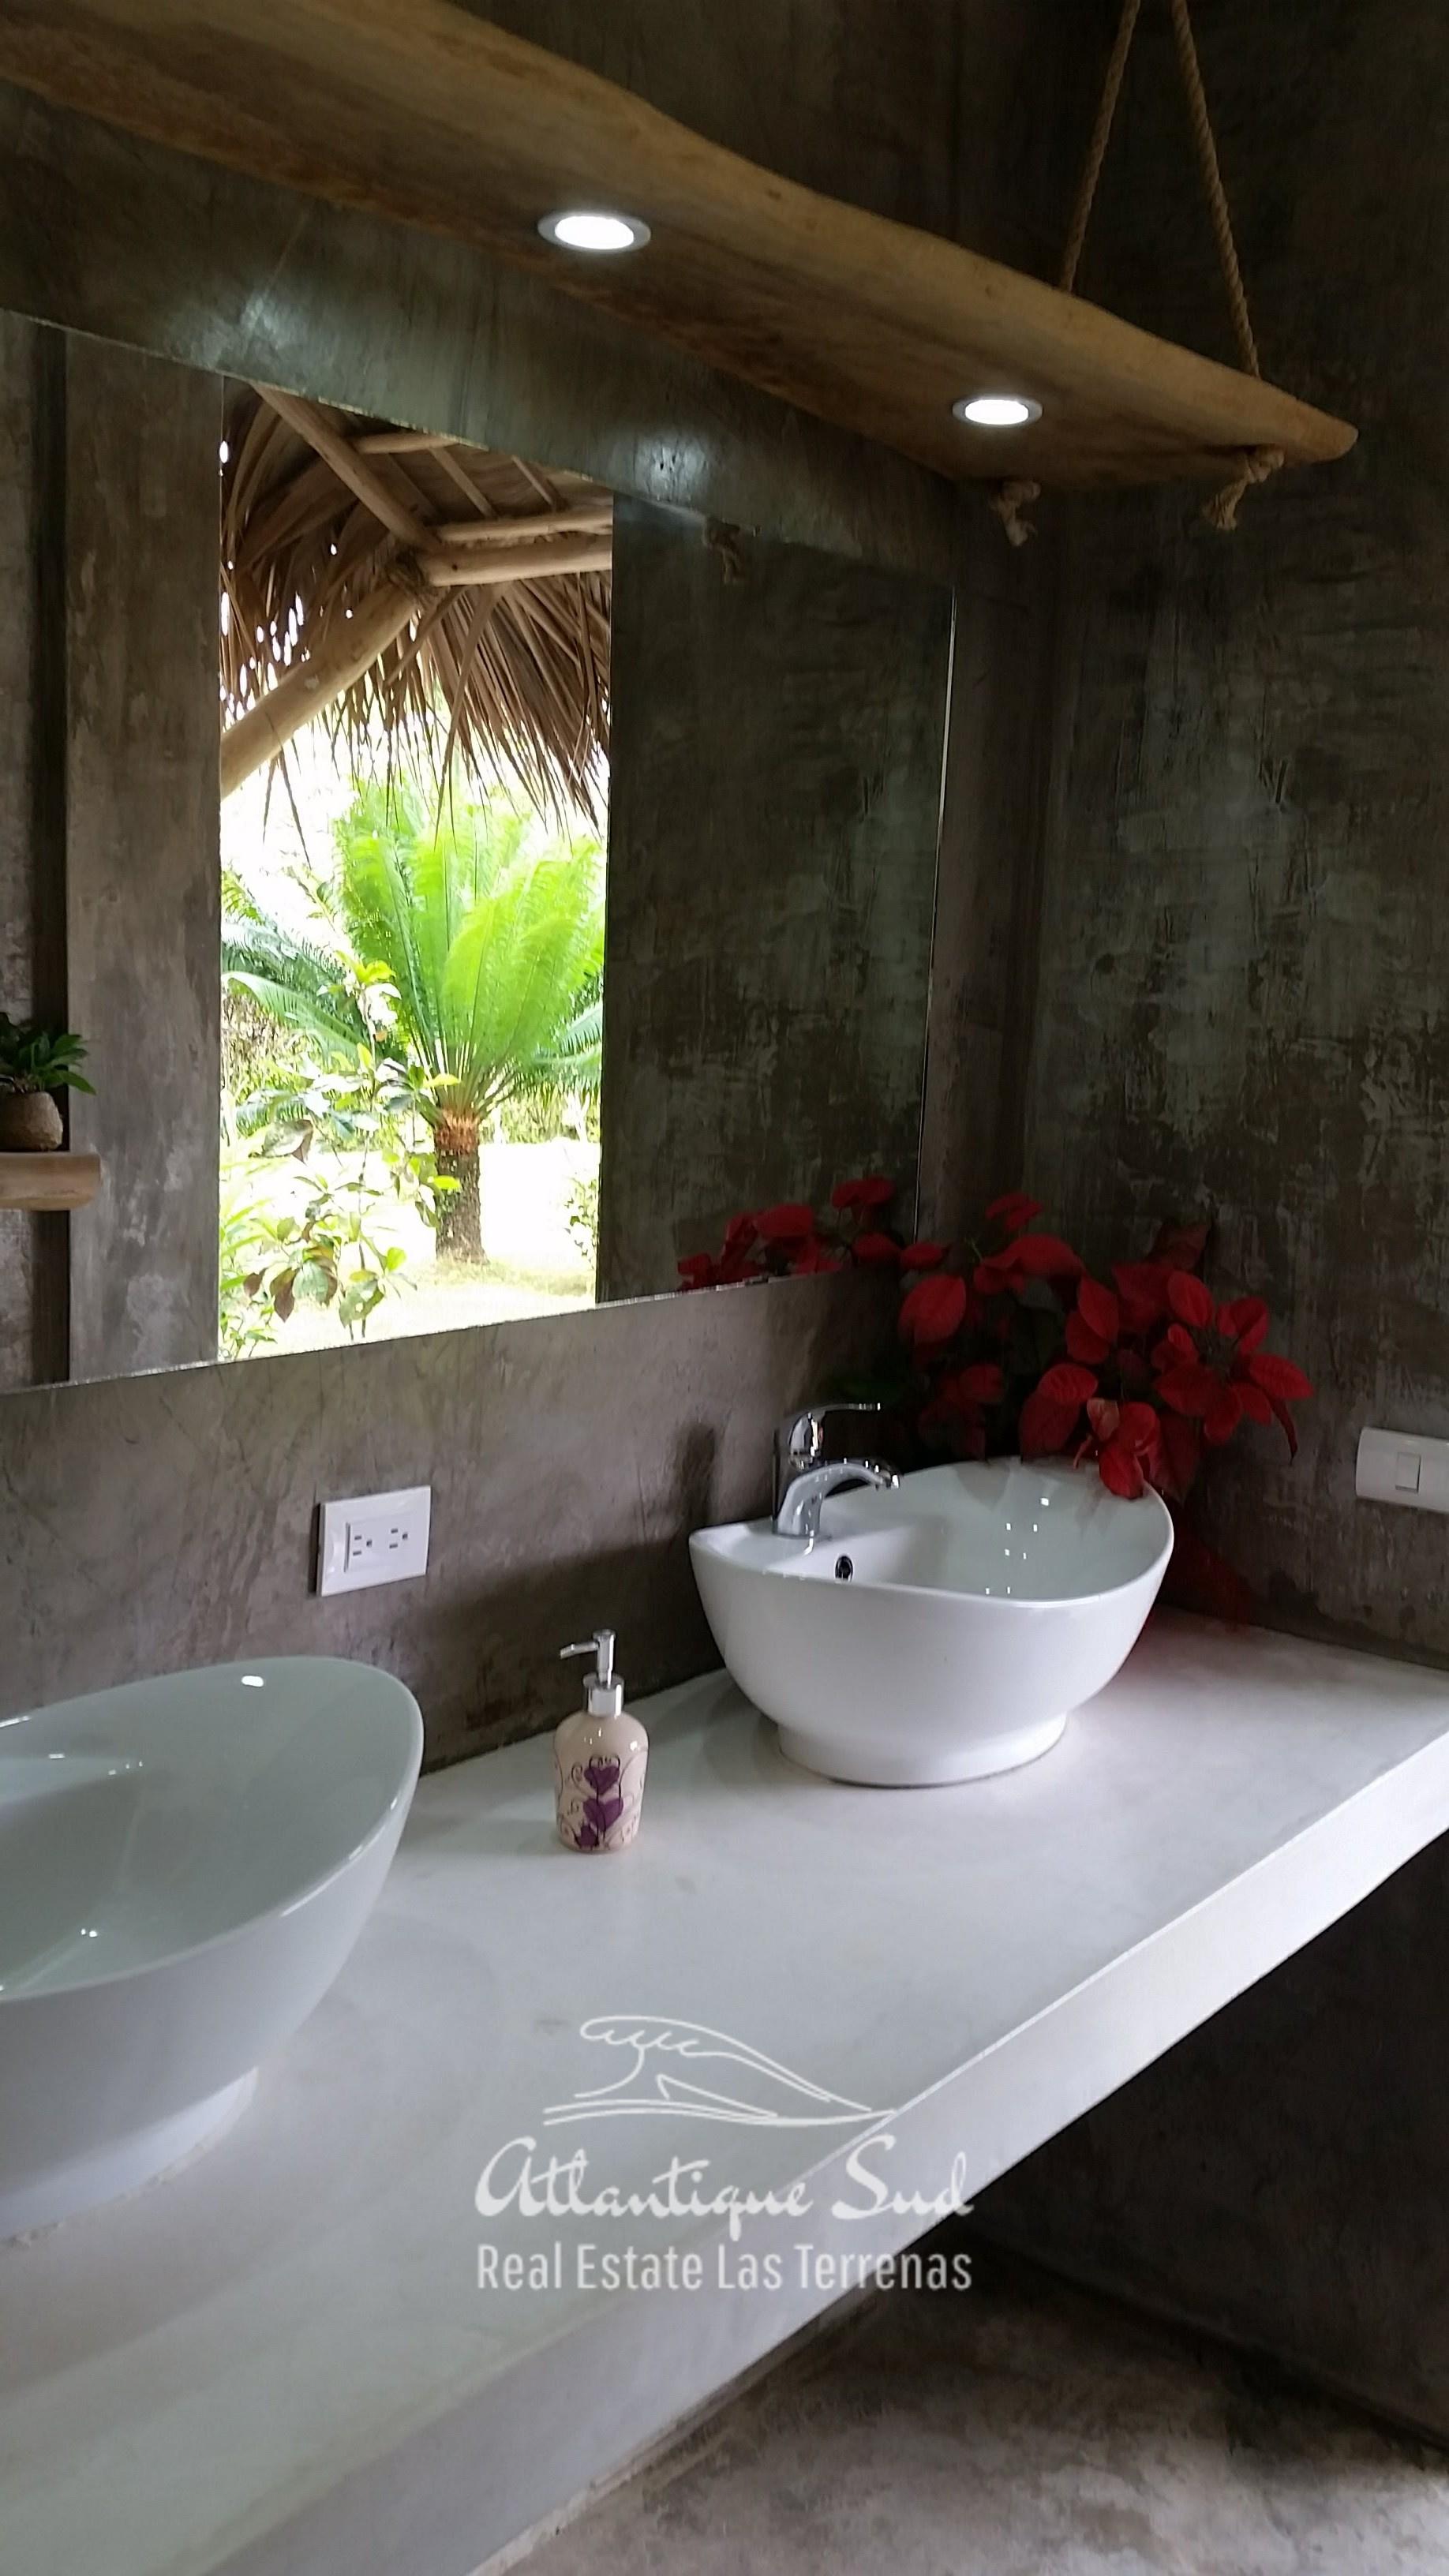 Typical caribbean hotel for sale Real Estate Las Terrenas Dominican Republic Atlantique Sud4.jpg